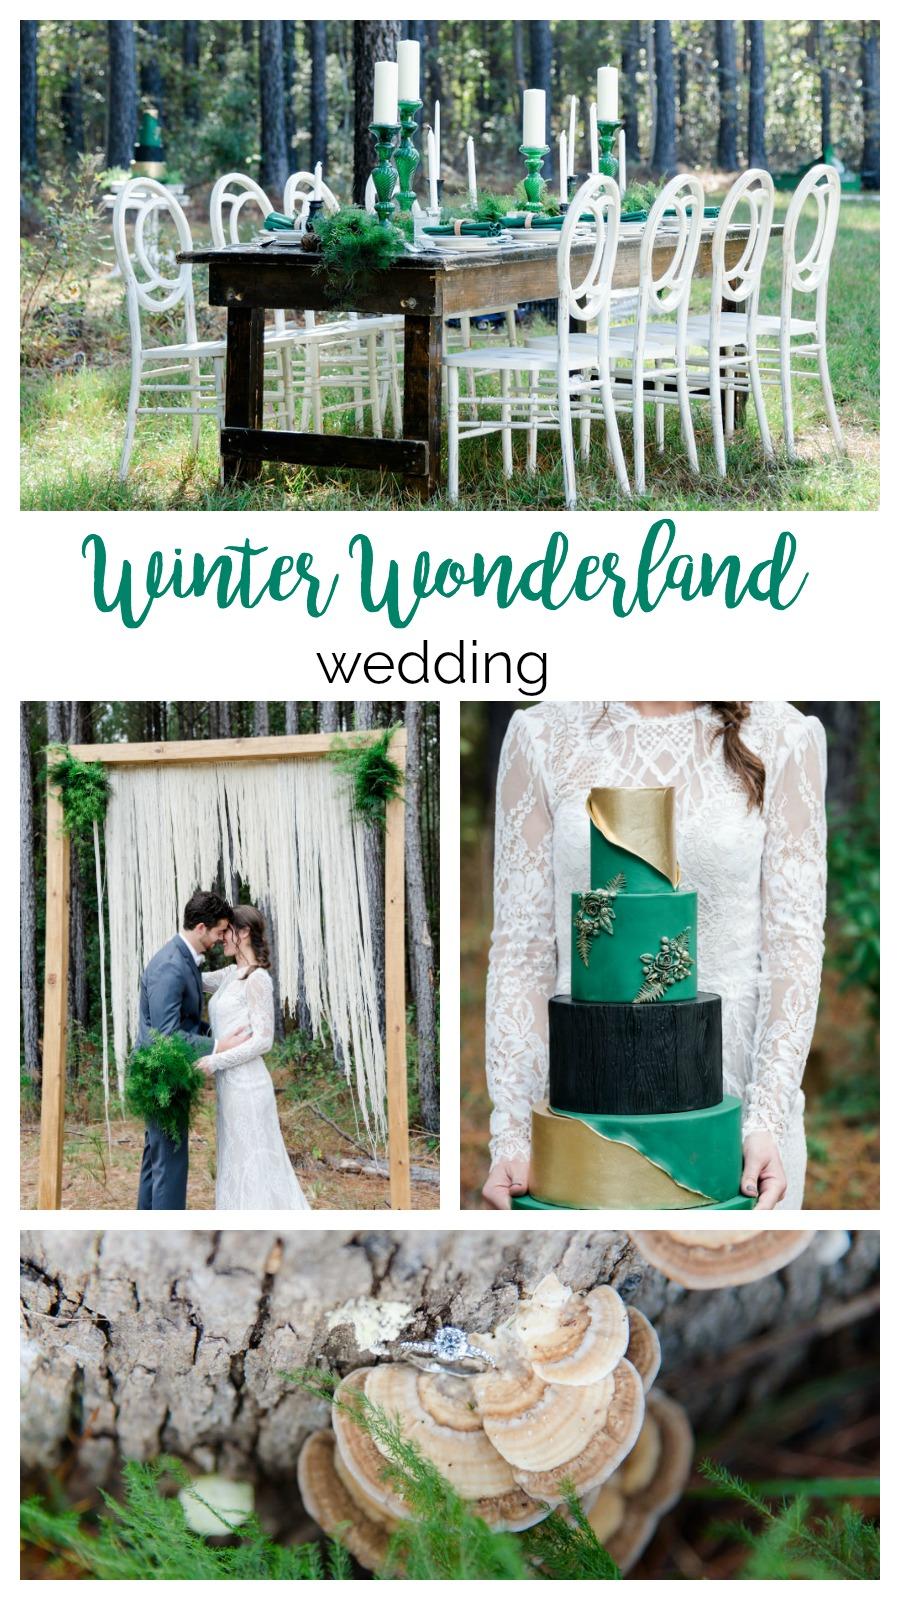 Green and Gold Winter Wonderland Wedding   Palmetto State Weddings   Leigh Heyward Photography   Charleston wedding   emerald wedding inspiration   Southern wedding inspiration